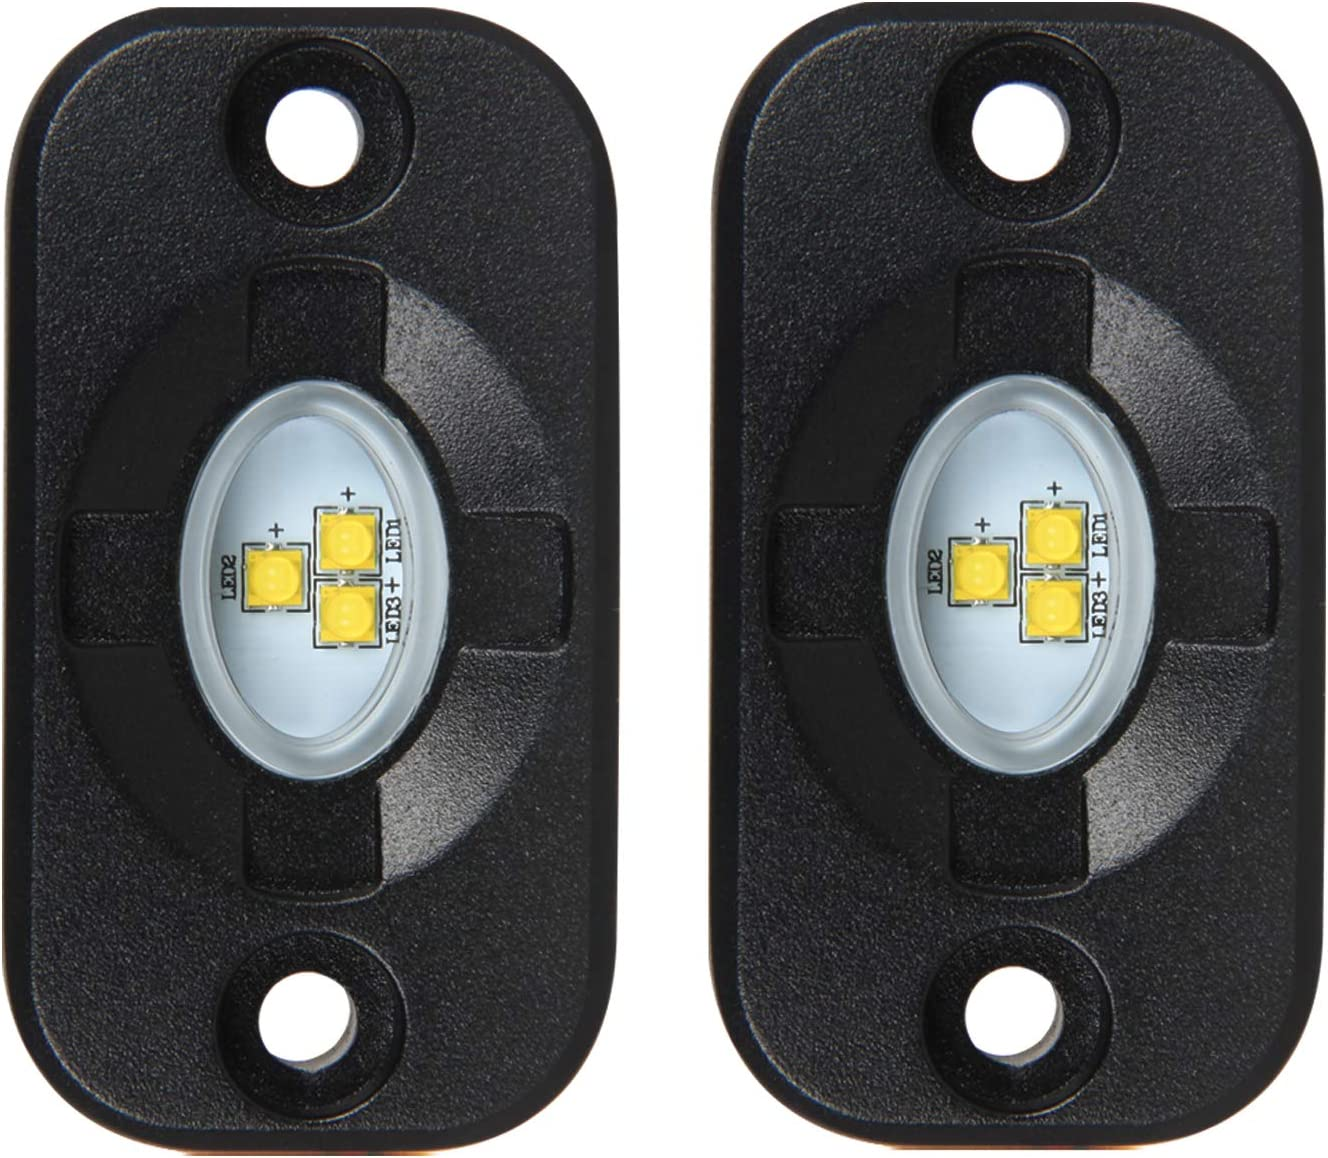 Bully Rock Crawler Hi-Intensity Max 48% OFF Store LED Lights Utility